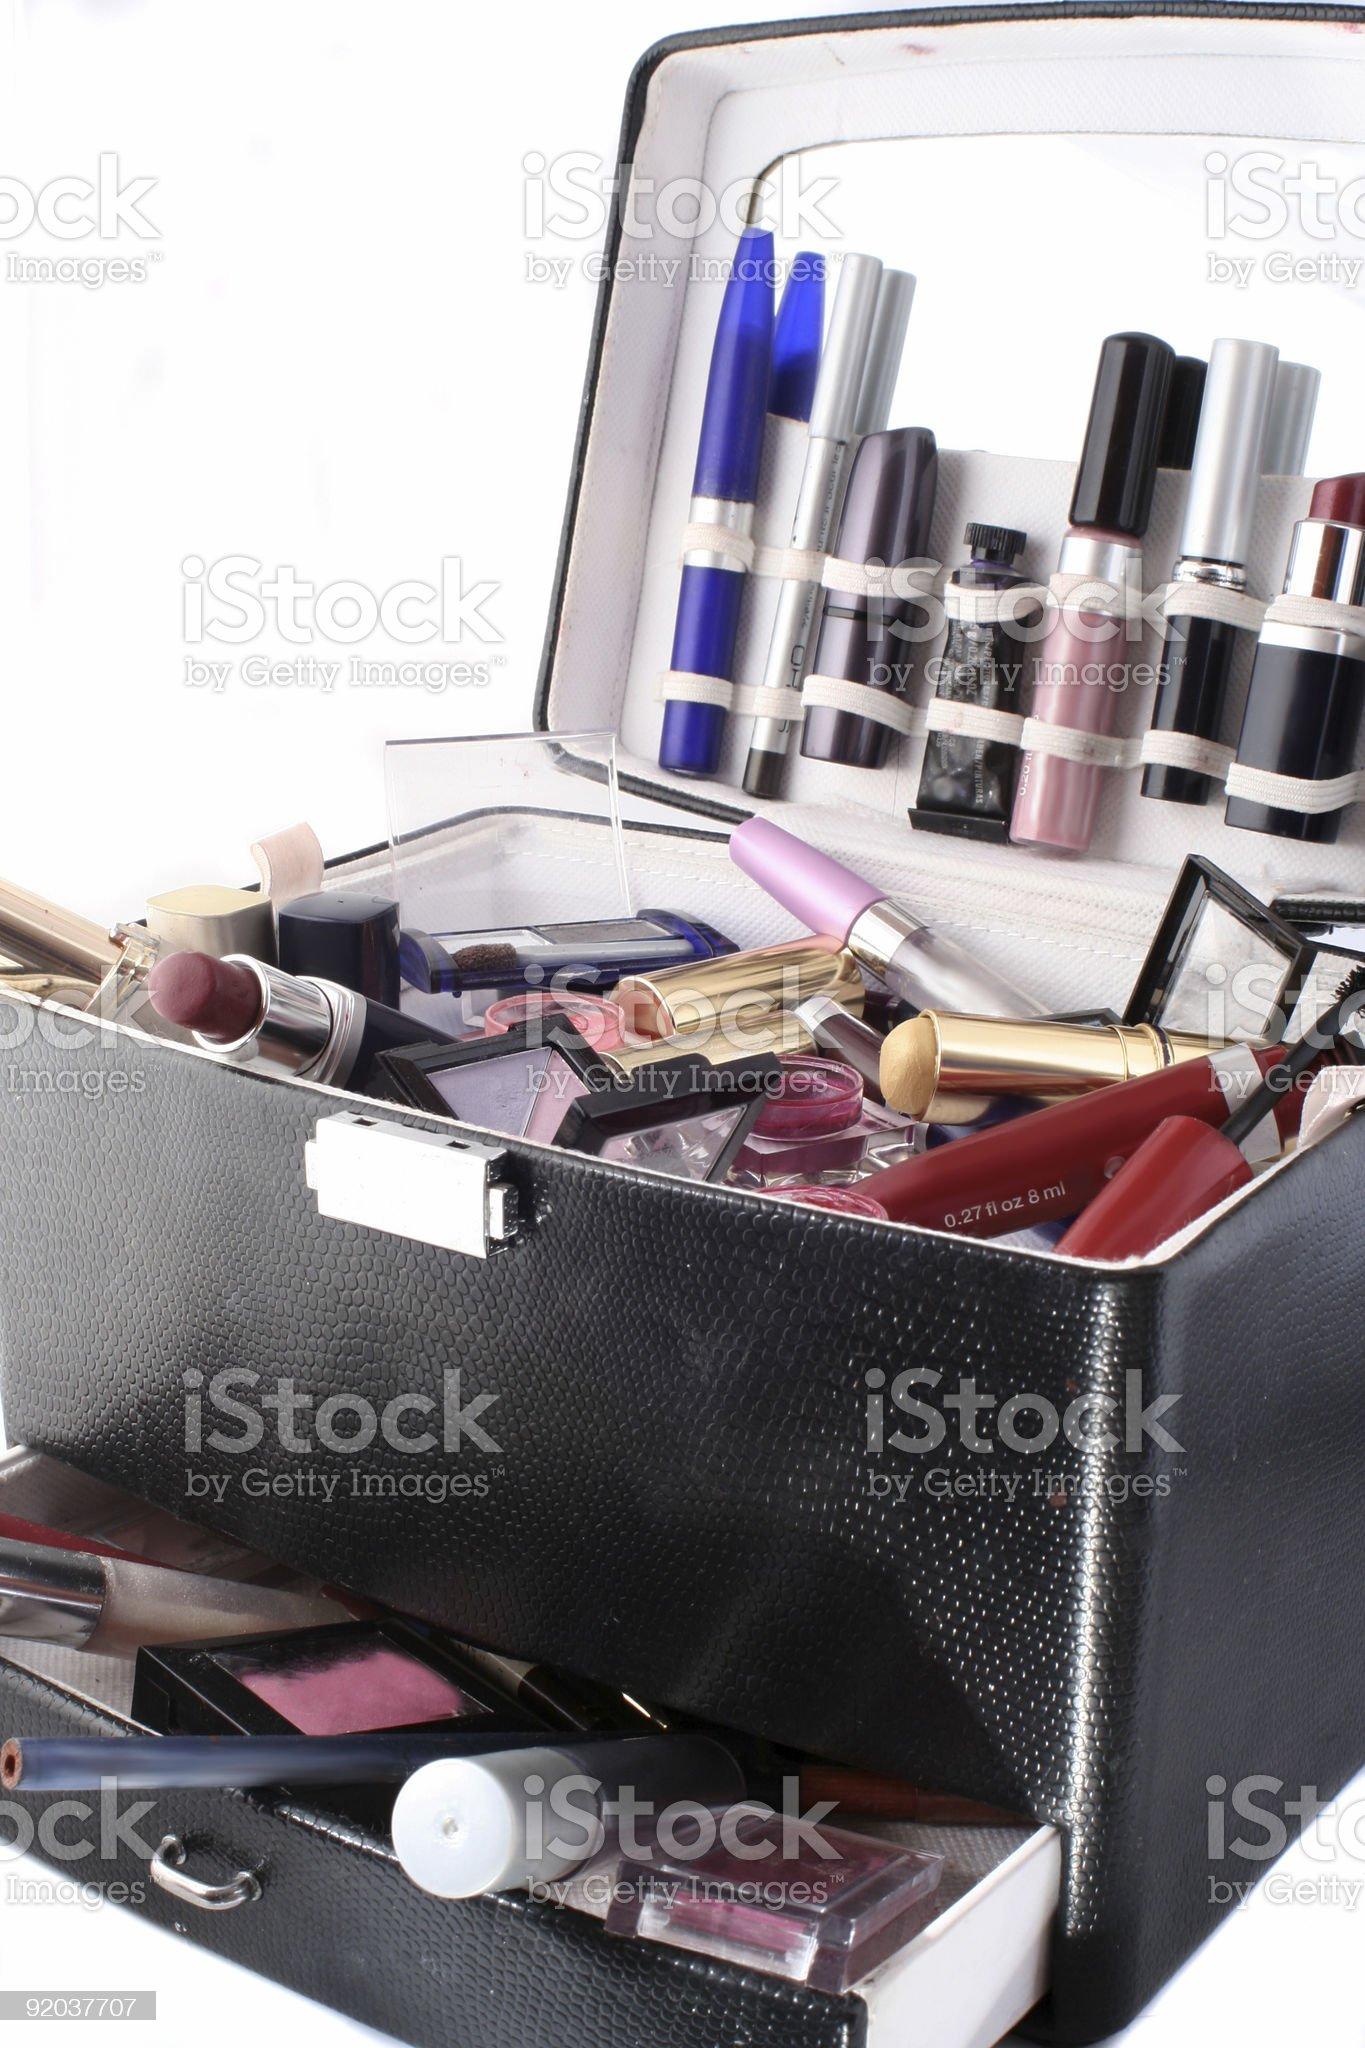 makeup case royalty-free stock photo